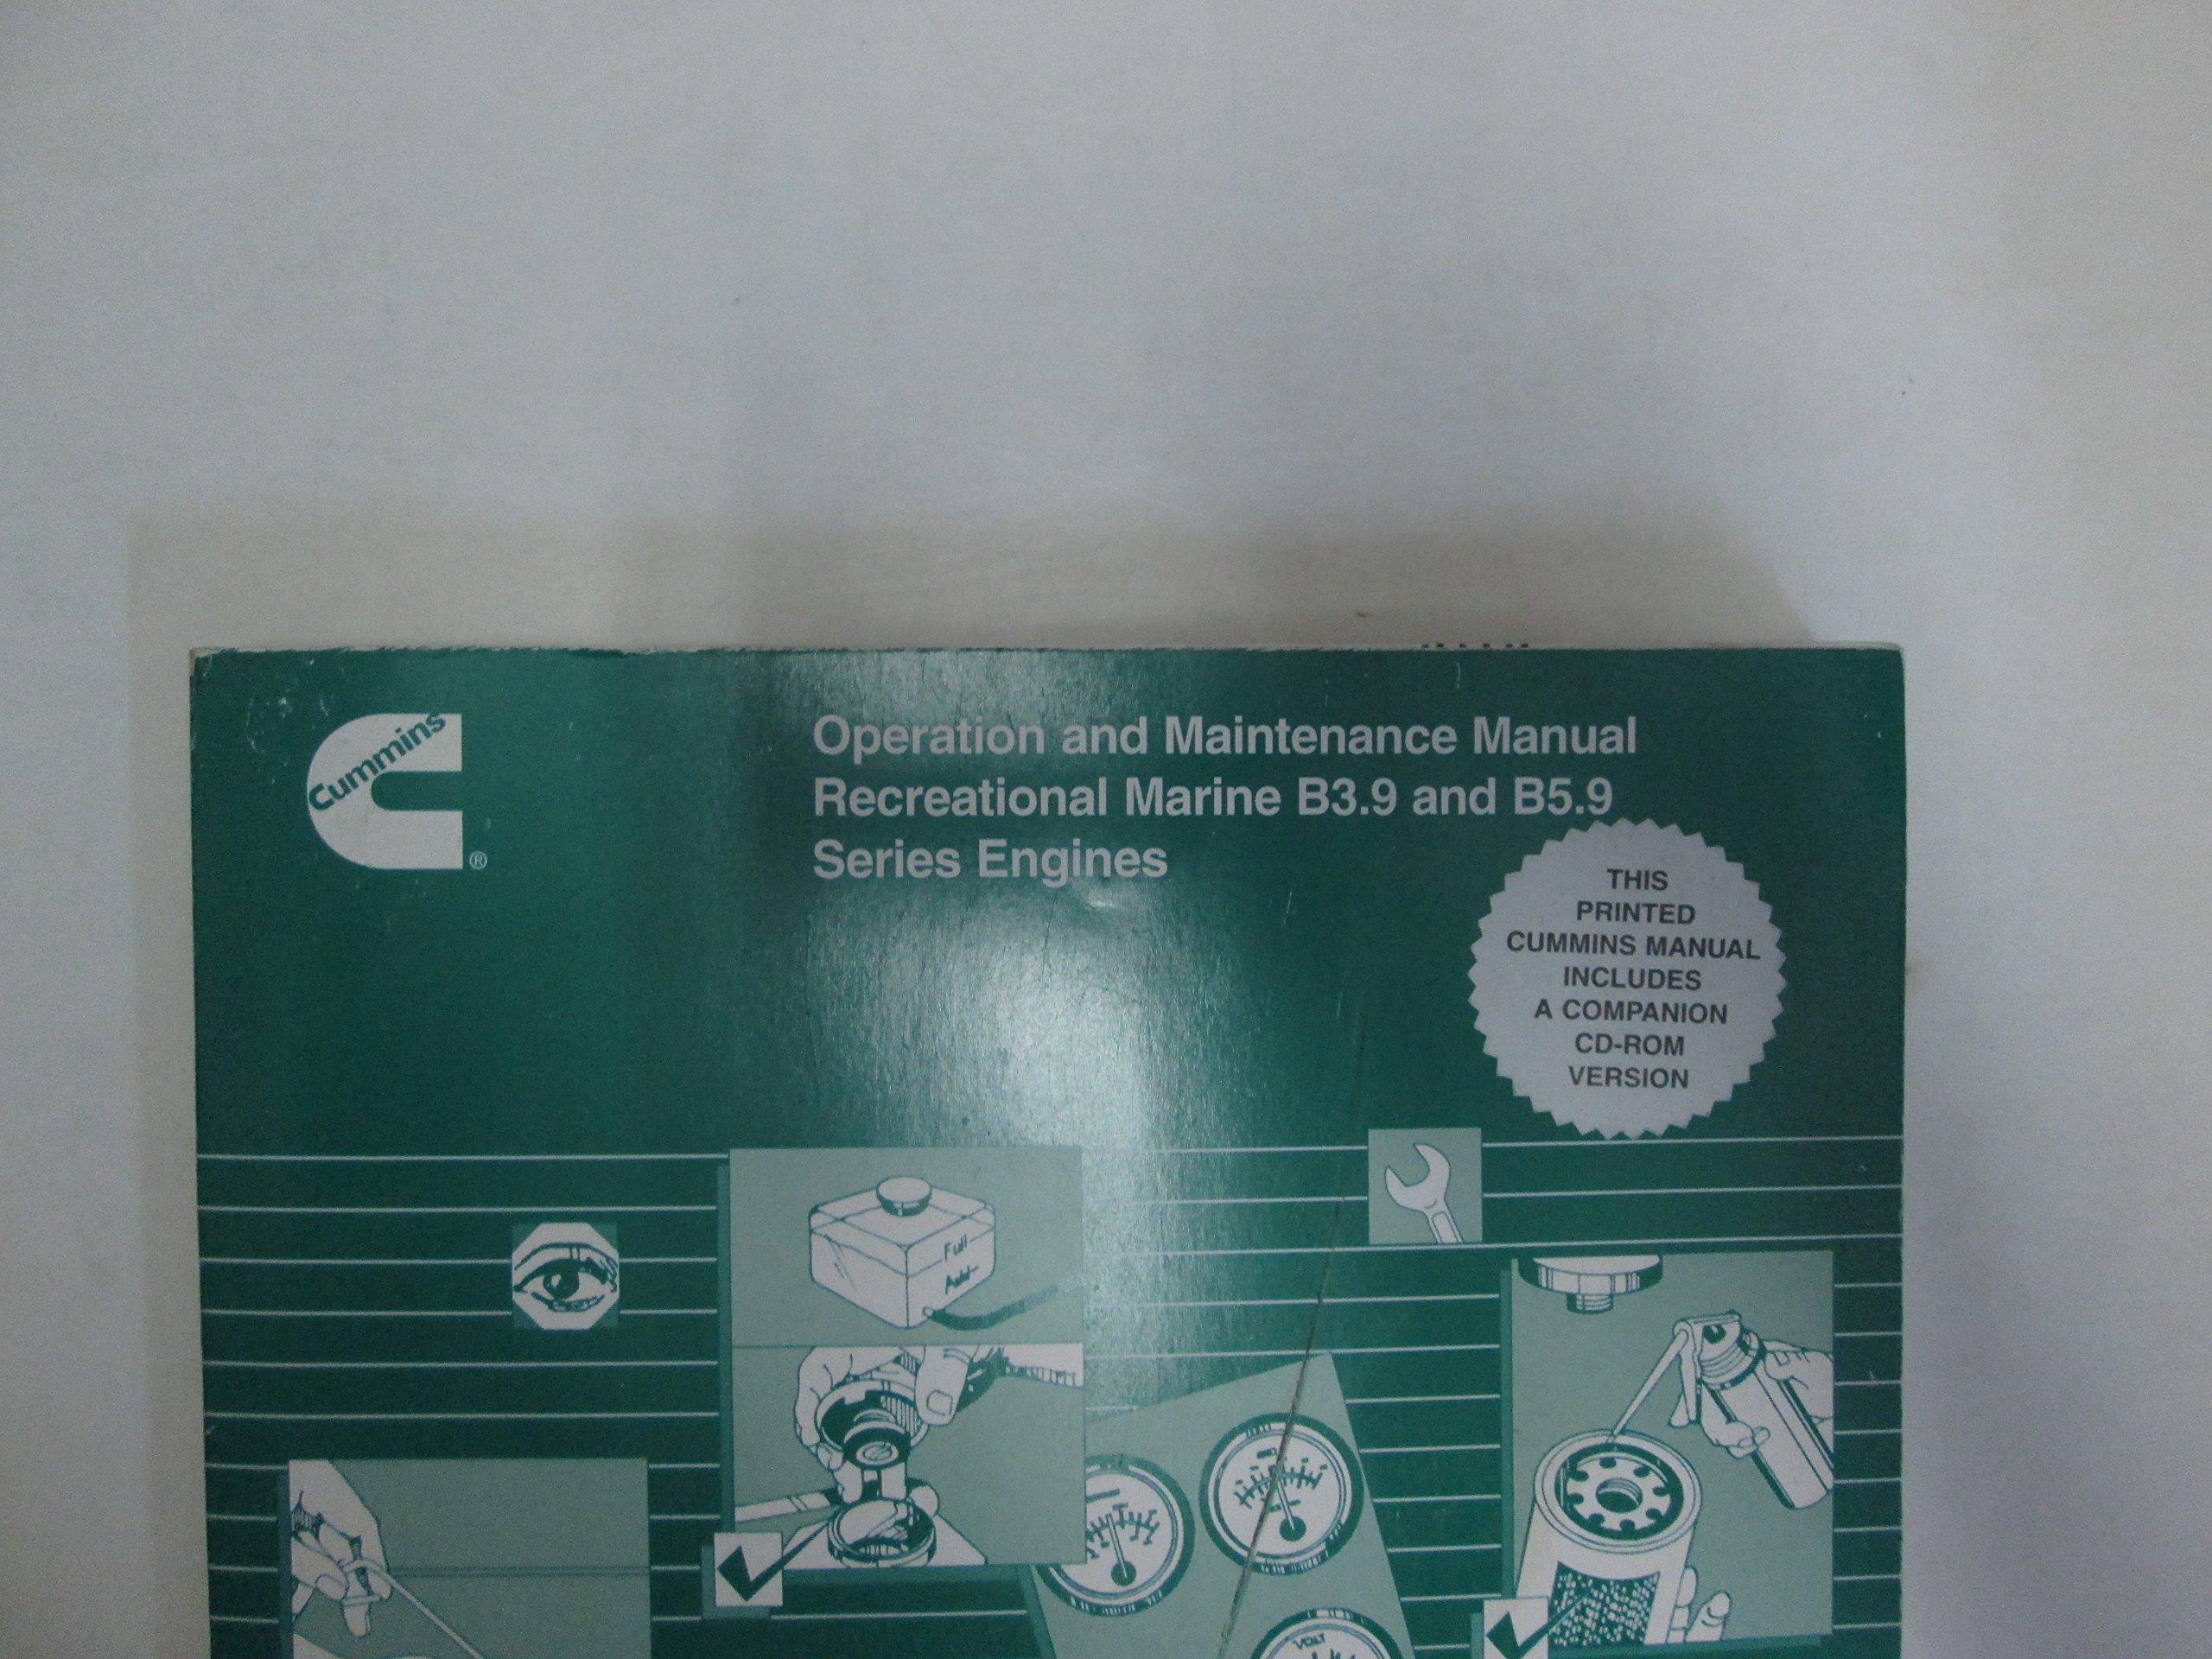 cummins marine engine manuals rh cummins marine engine manuals manualspath com